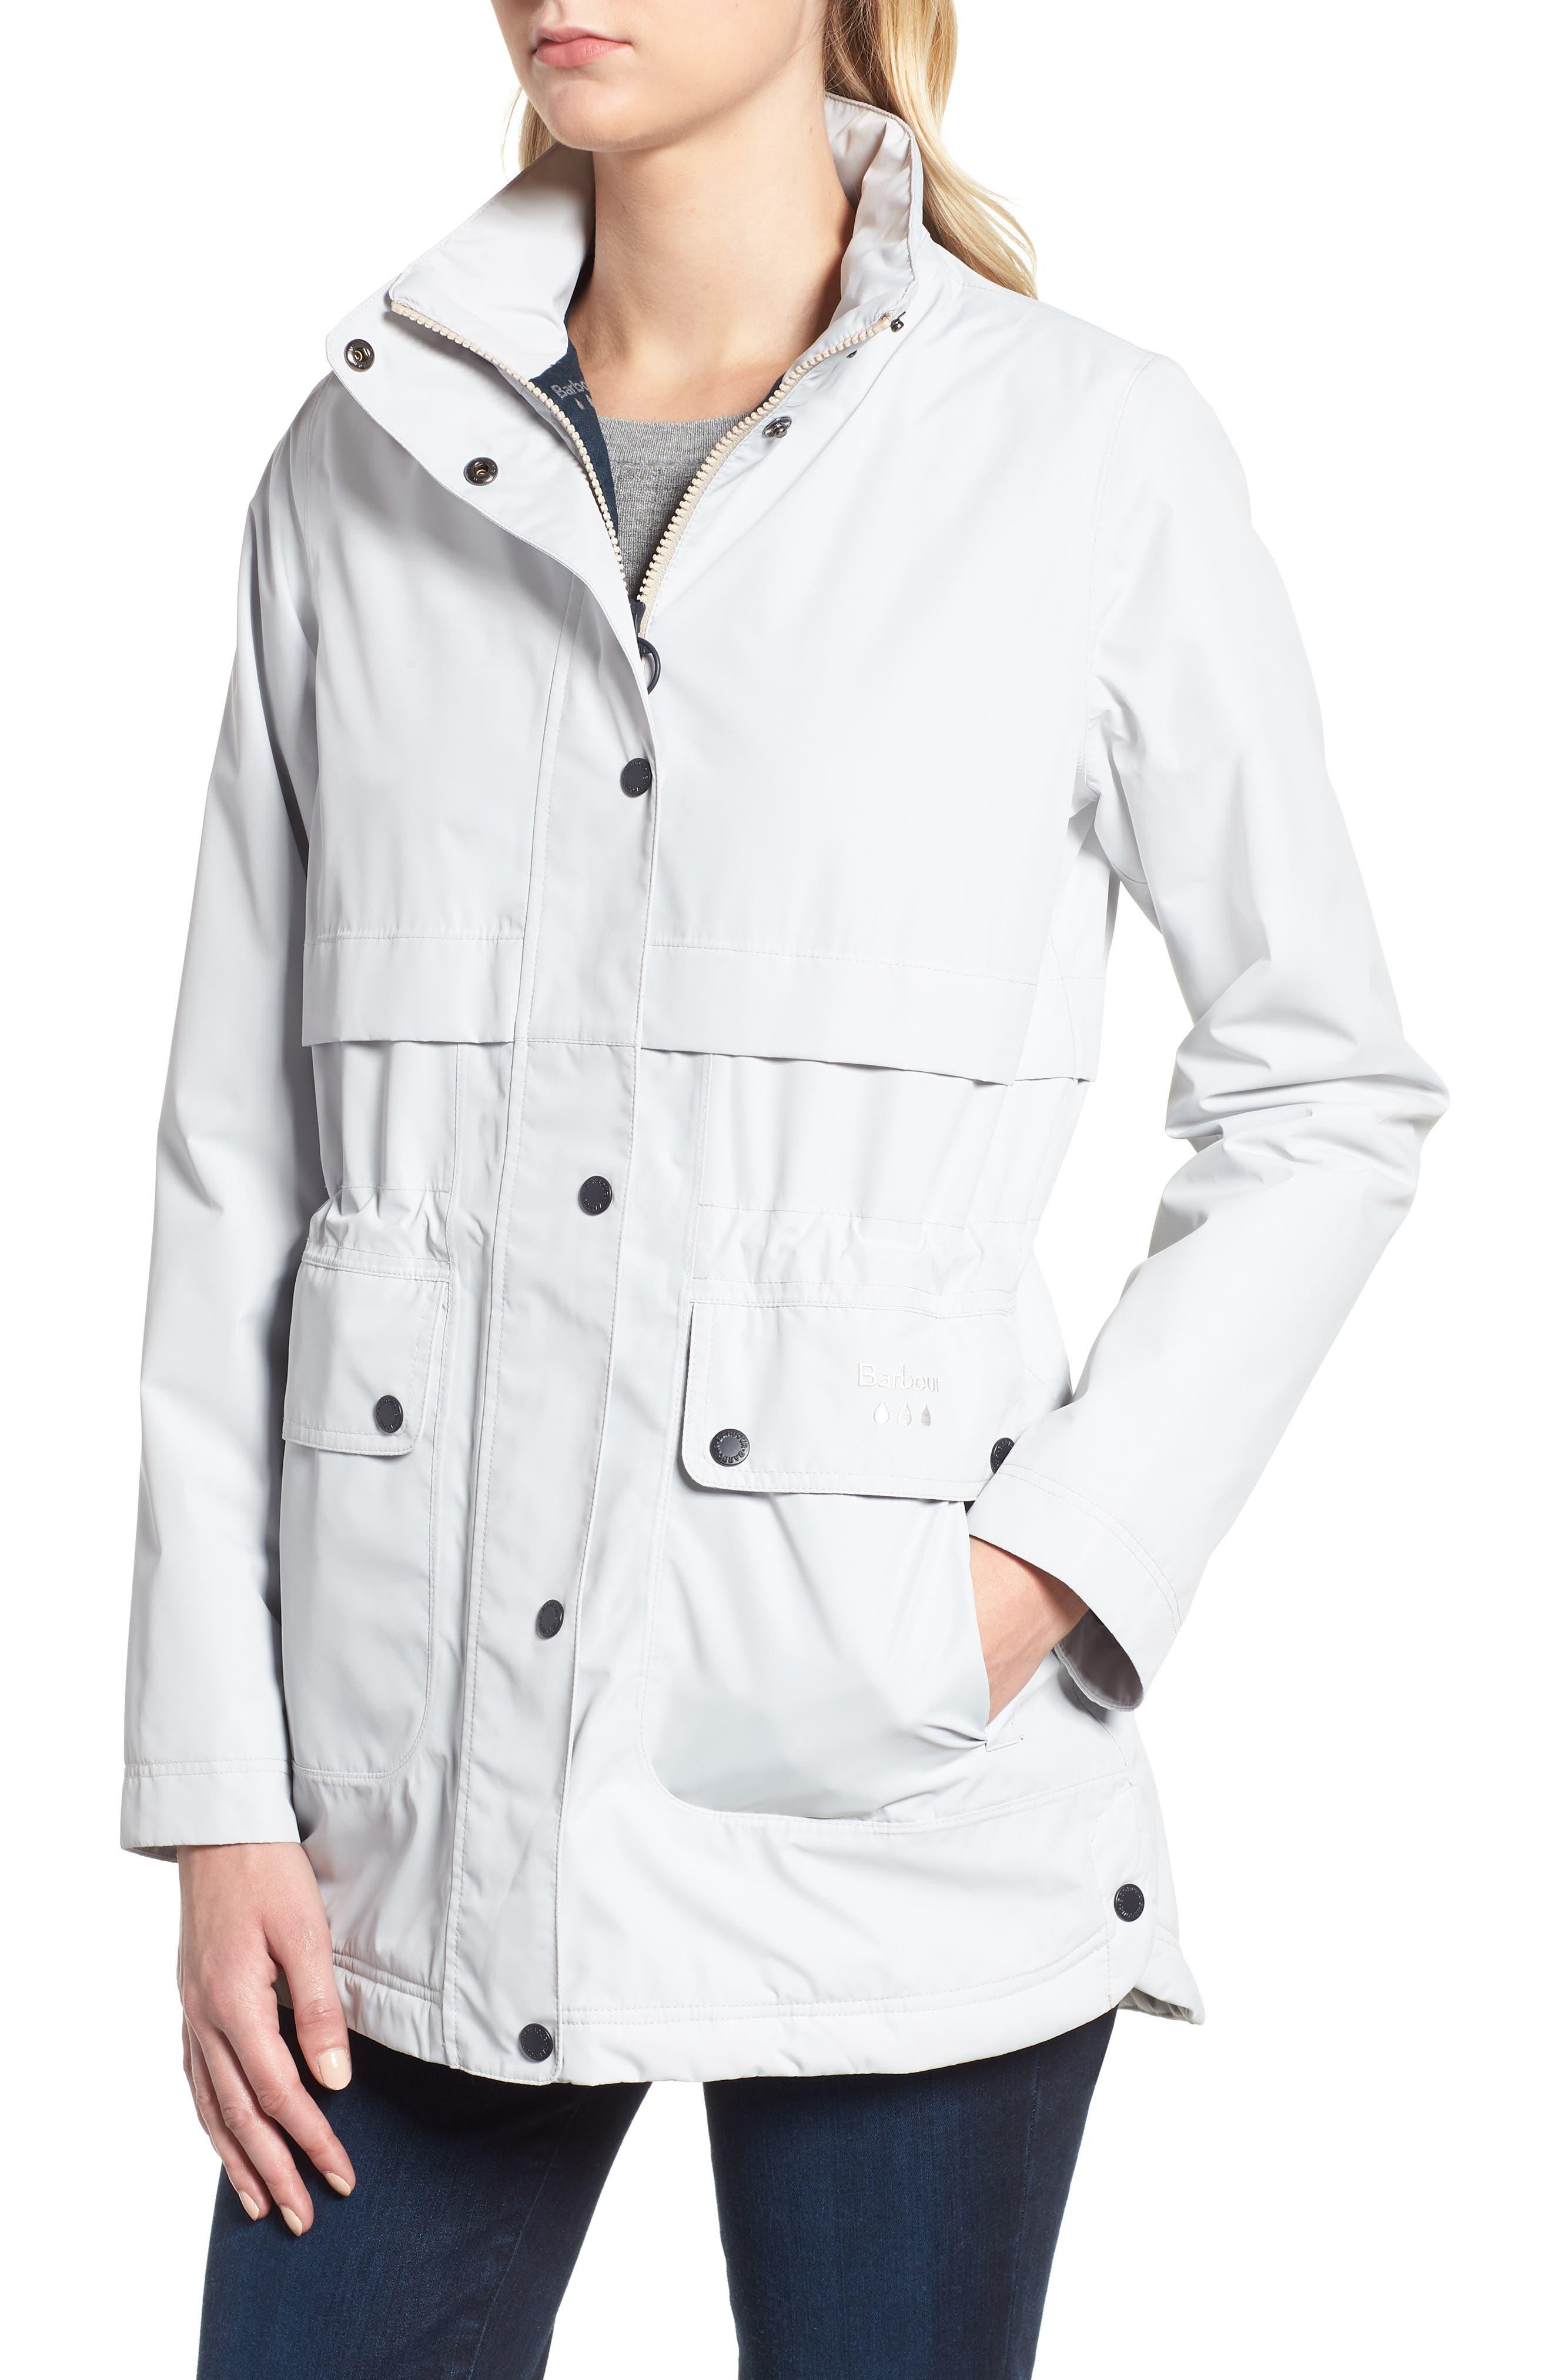 Altair Waterproof Hooded Jacket,                             Alternate thumbnail 4, color,                             ICE WHITE